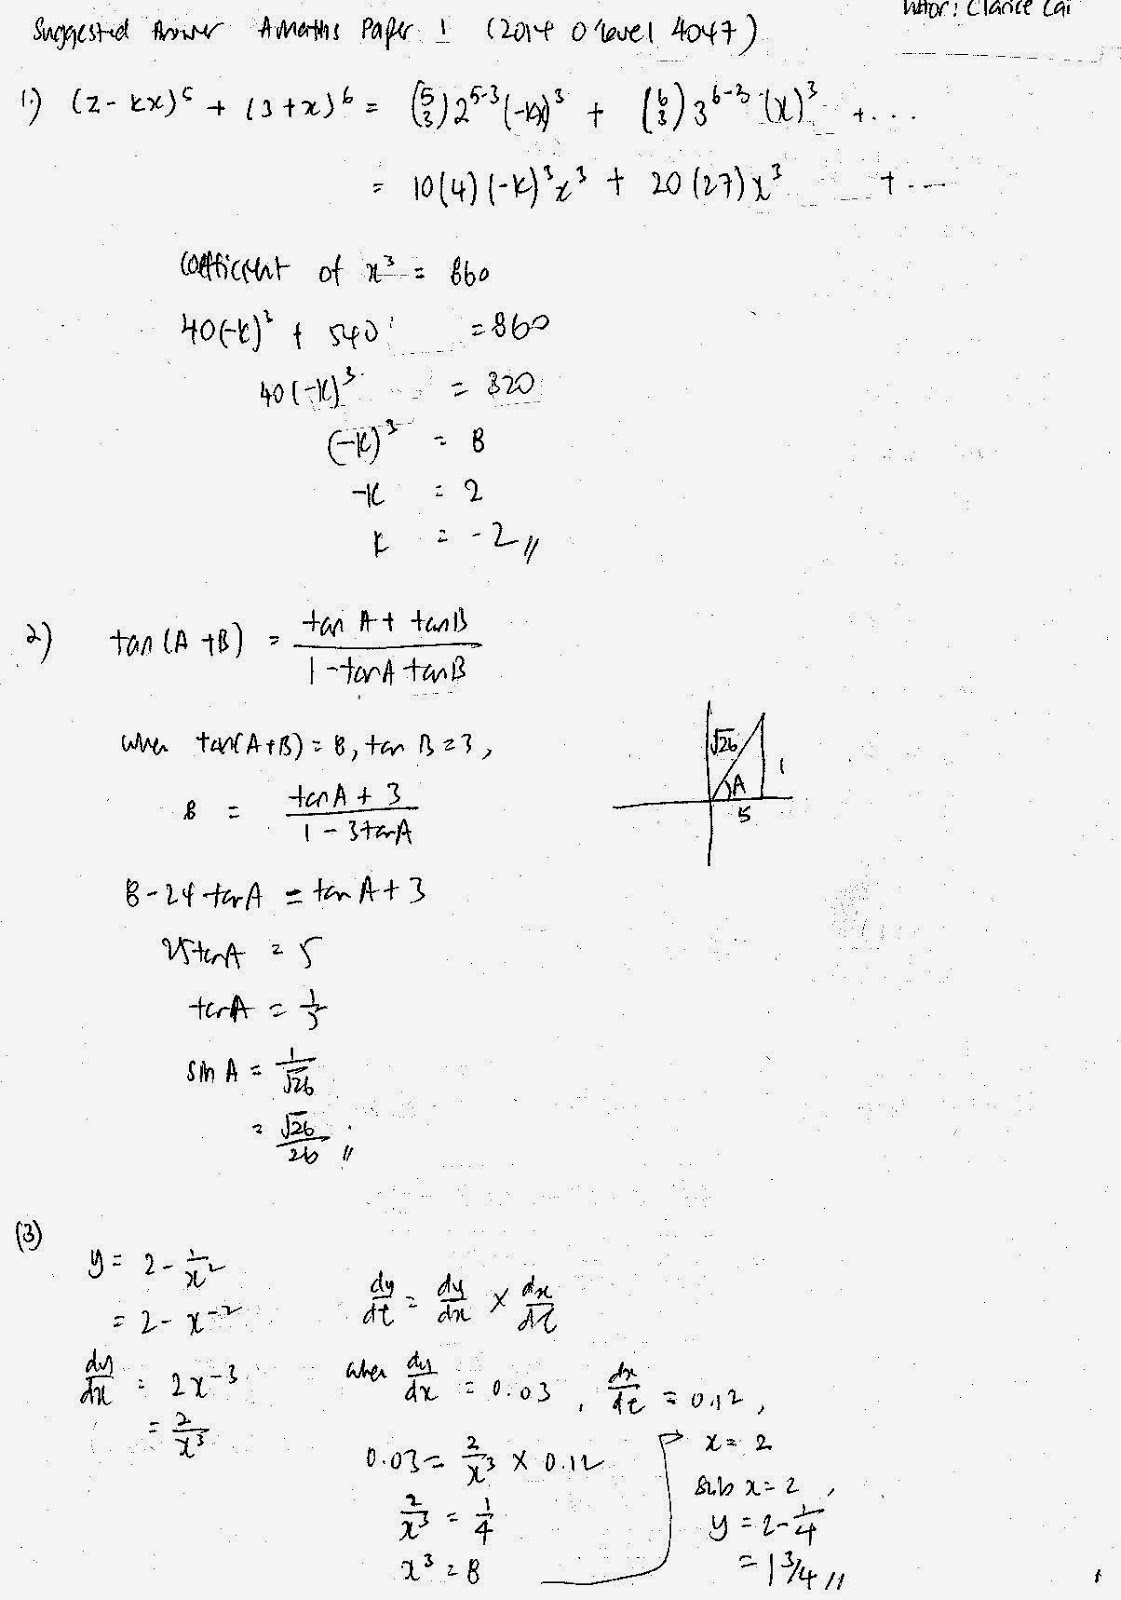 ... logarithms applications log trigonometric identities question jφss